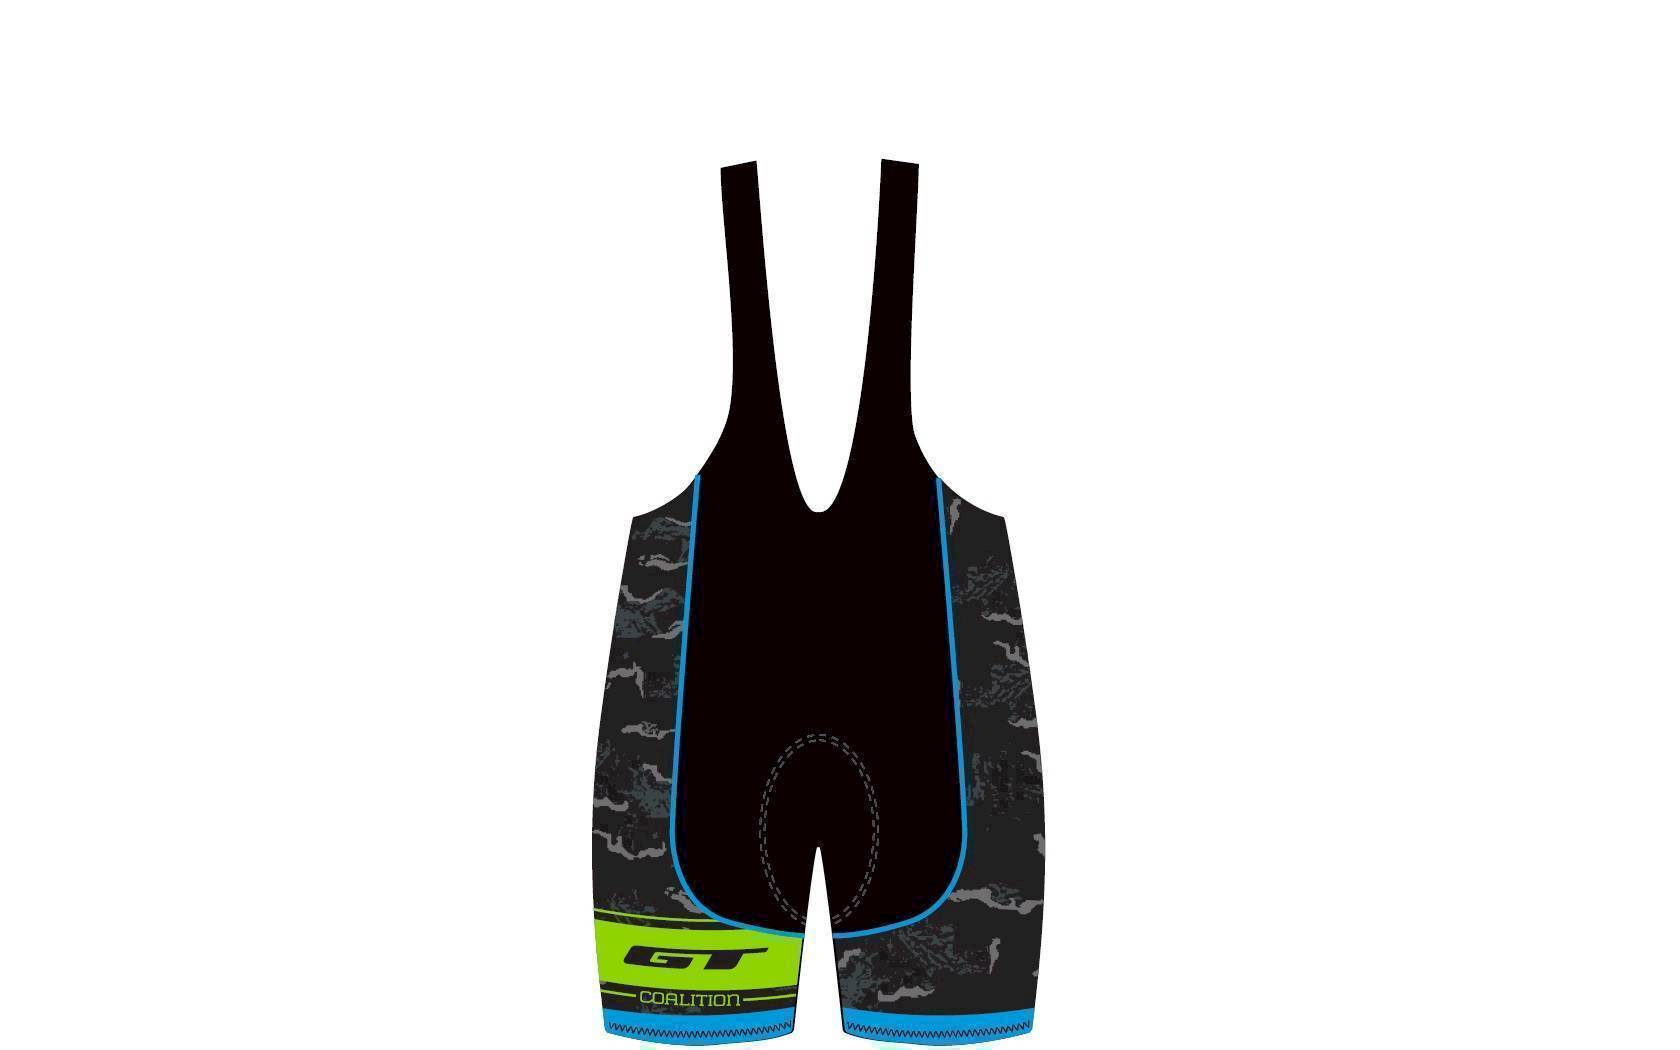 2017 GT KRAŤASY S LACLEM RACE, BLUE/GREEN XXL